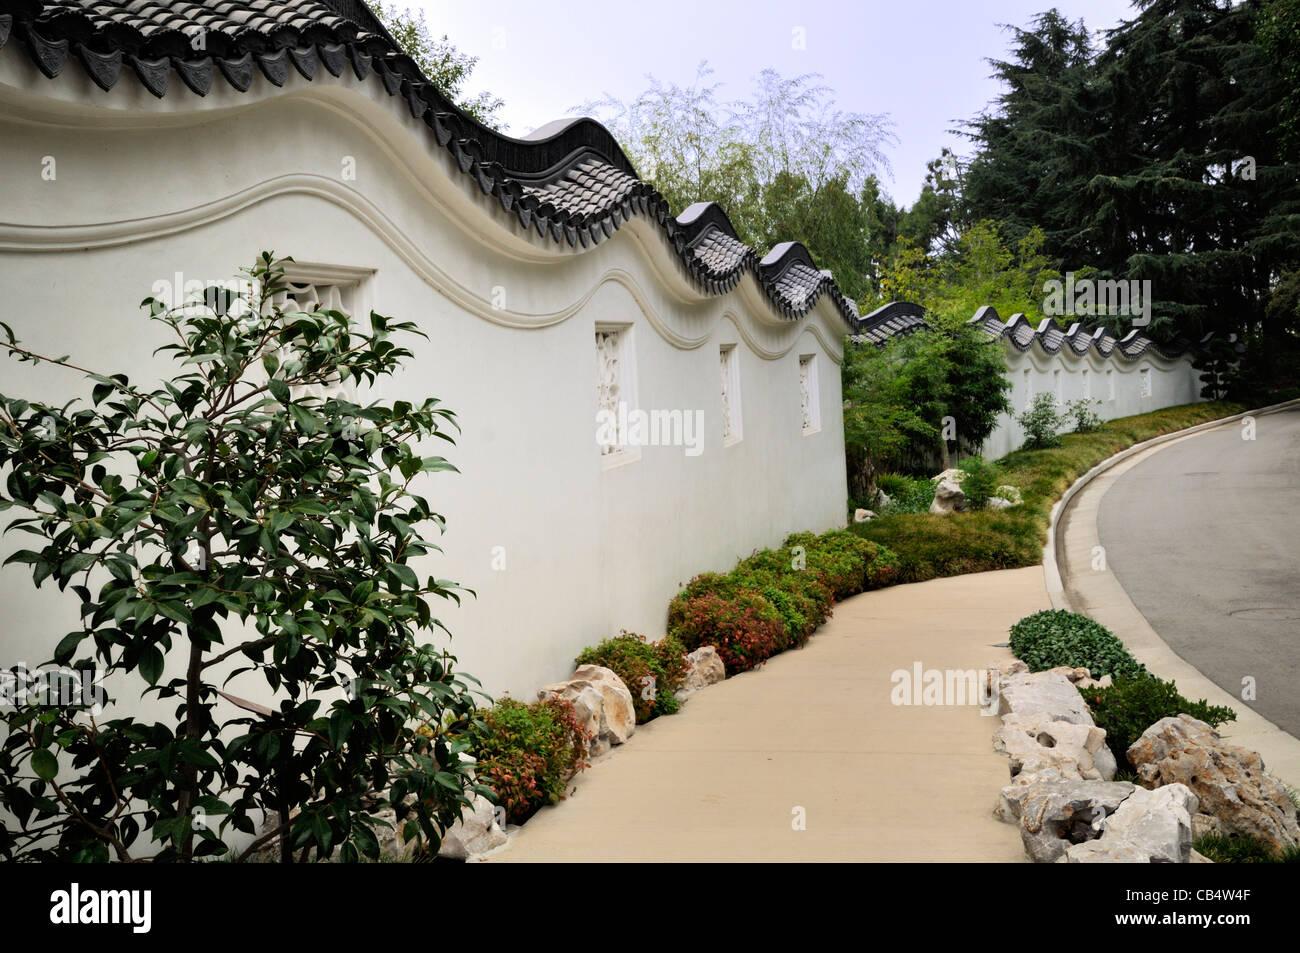 Wall in the Chinese garden, Huntington Botanical Garden, San Marino, California - Stock Image